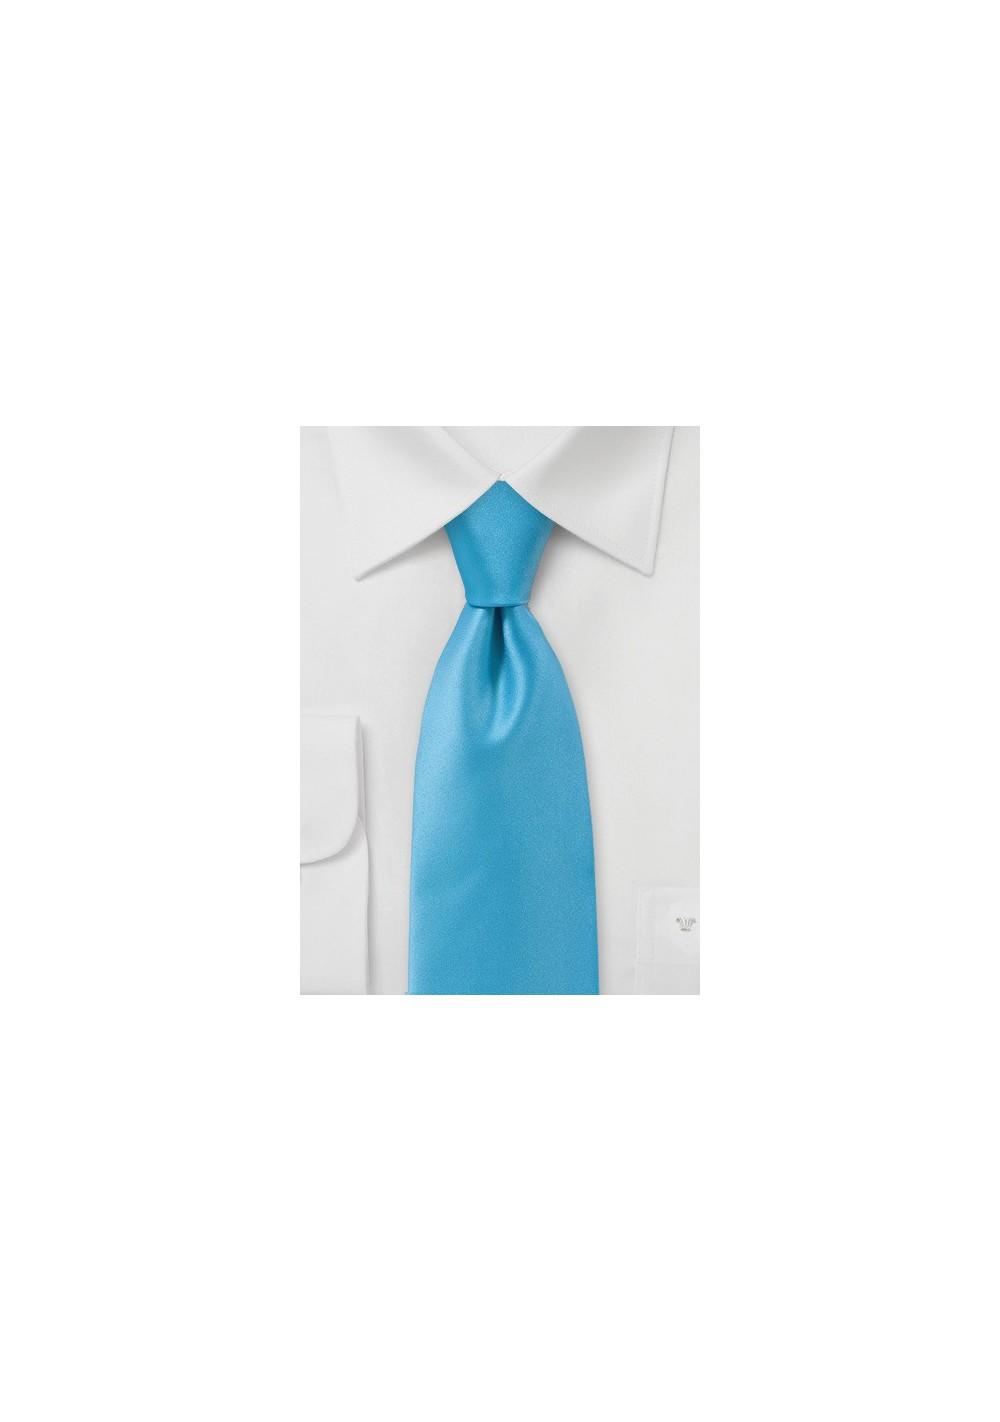 Solid Color Tie in Mermaid Blue